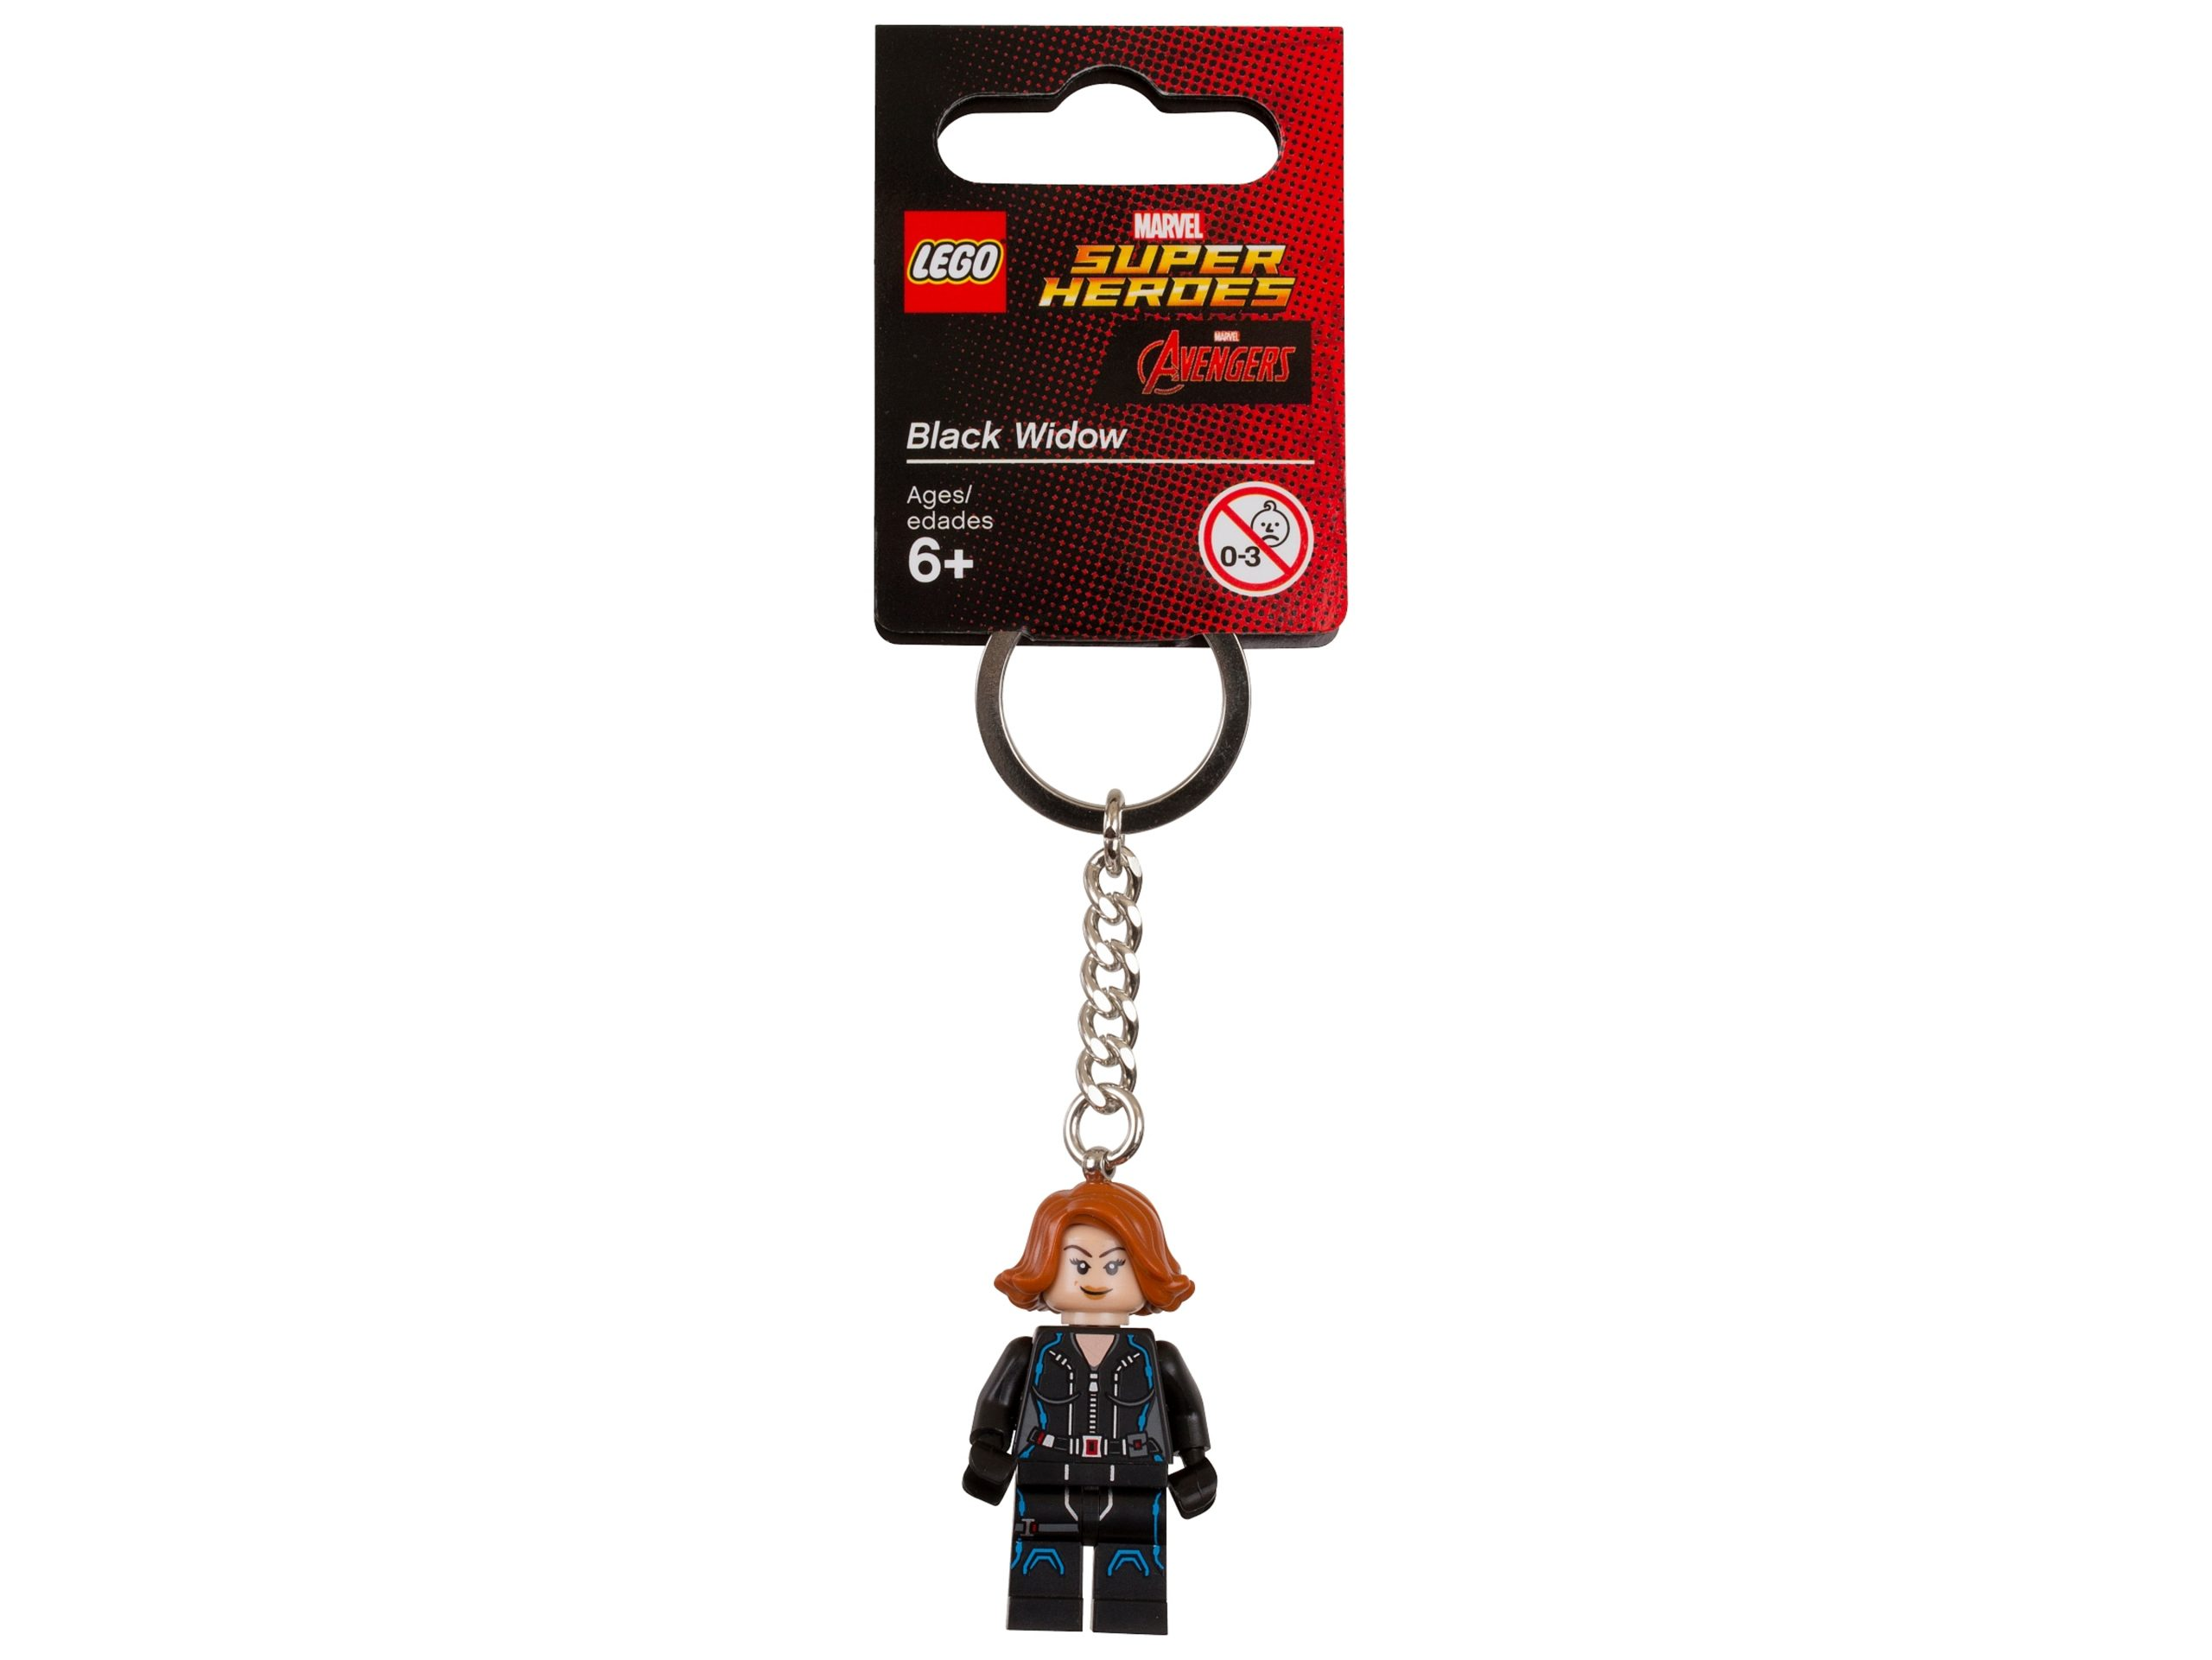 lego 853592 marvel super heroes black widow key chain scaled